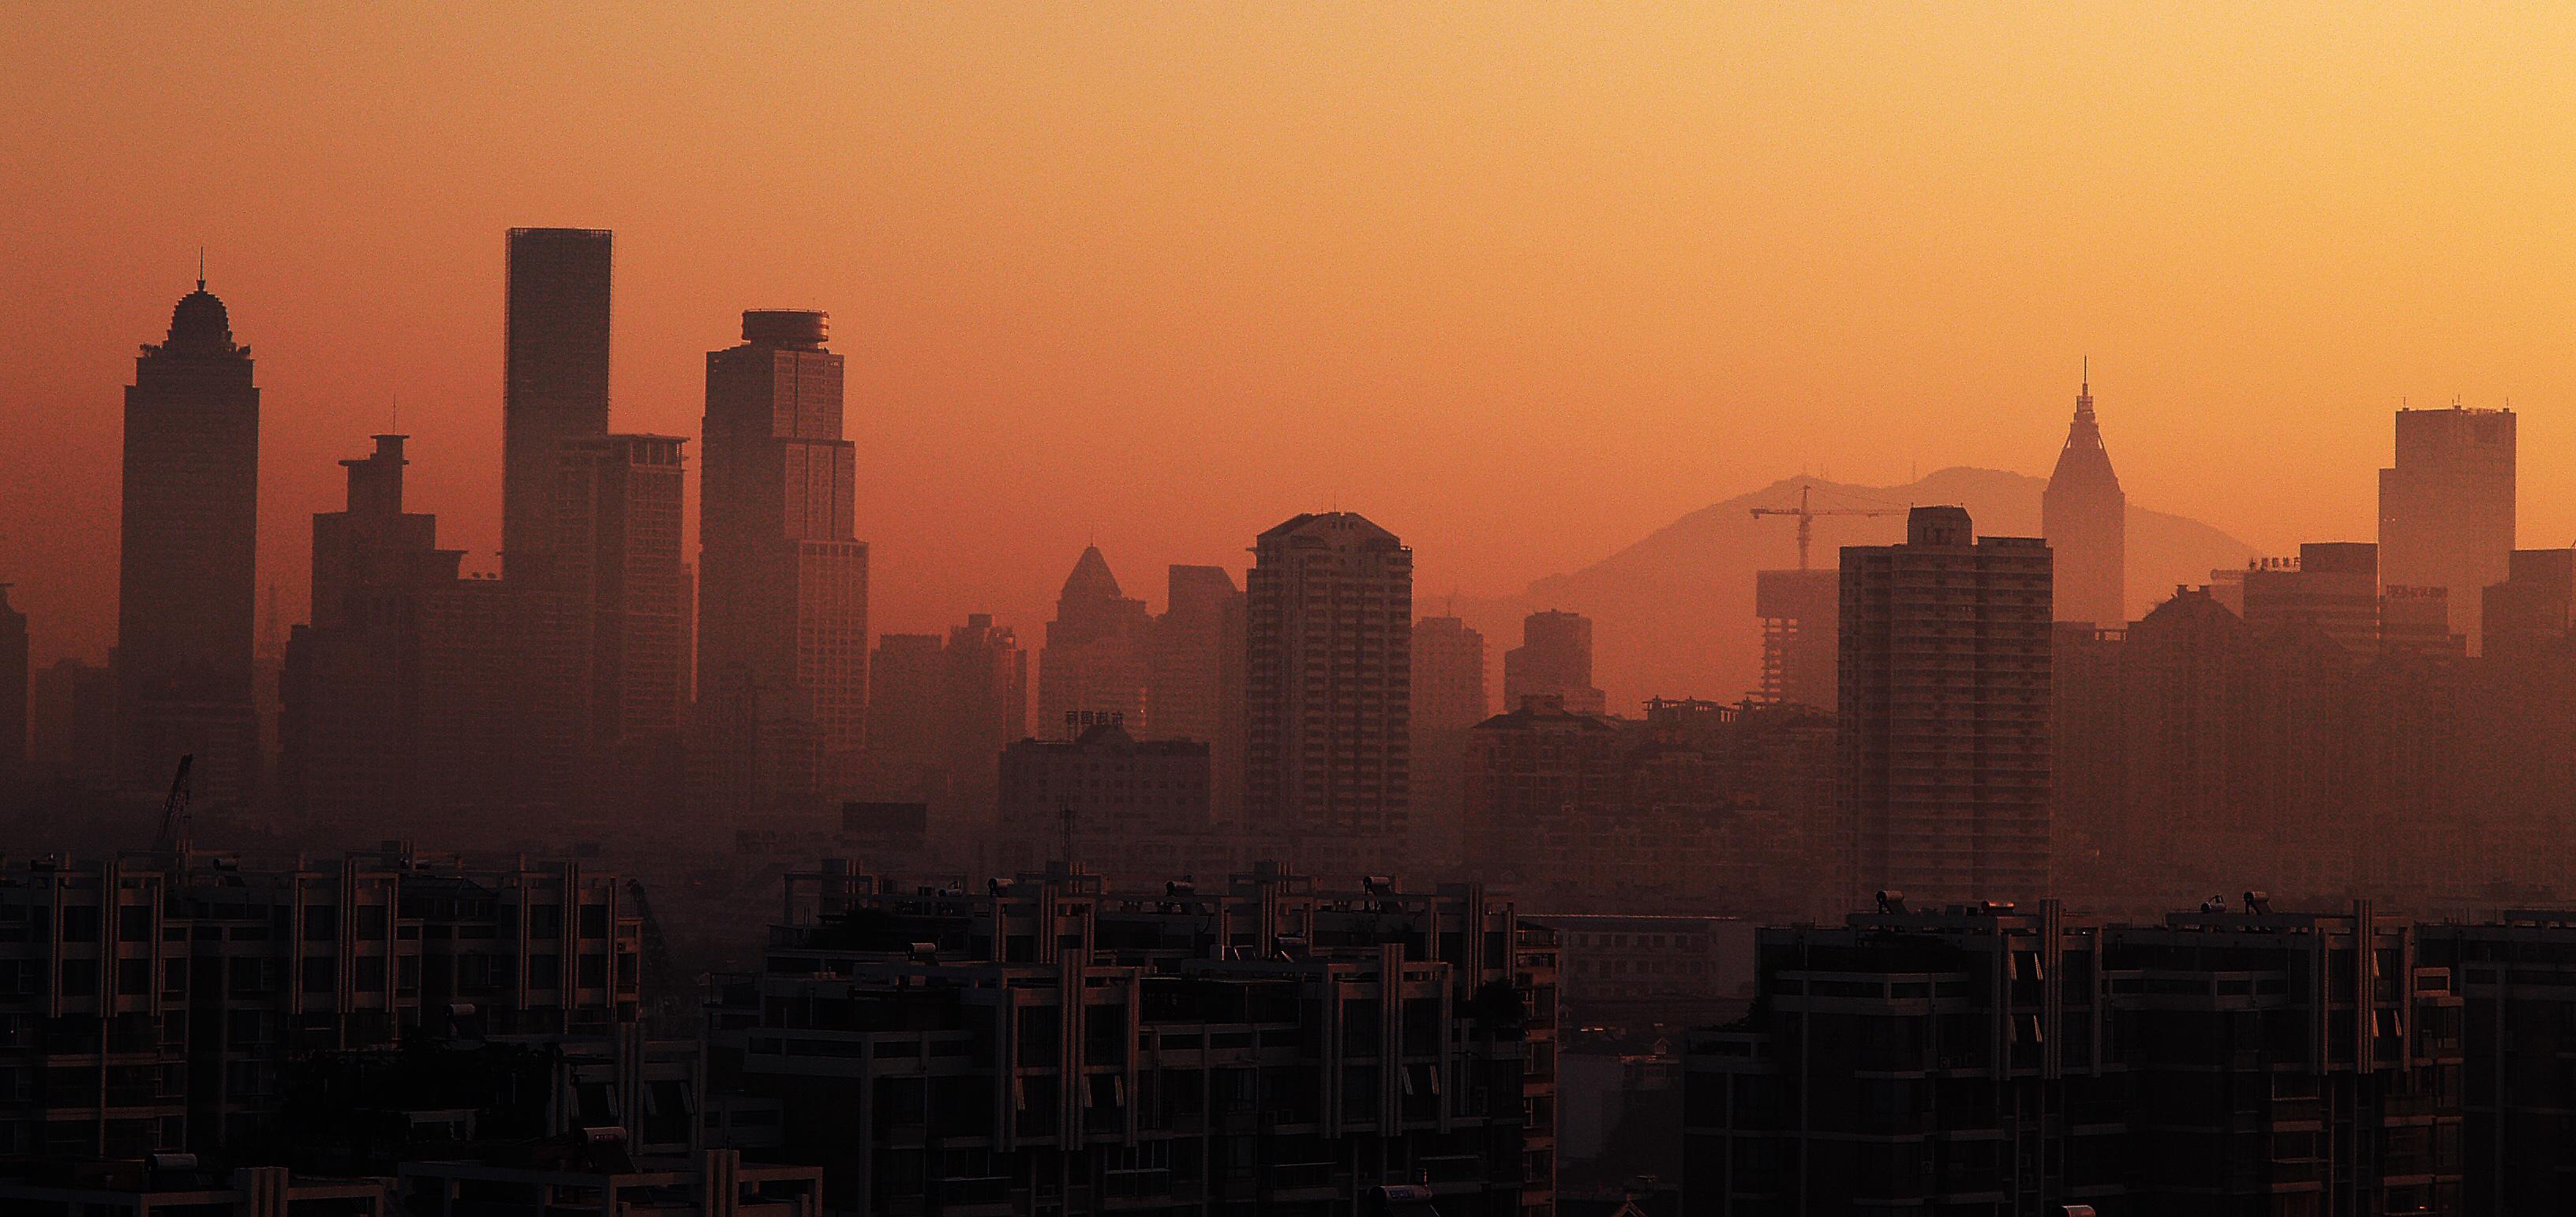 Nanjing landscape